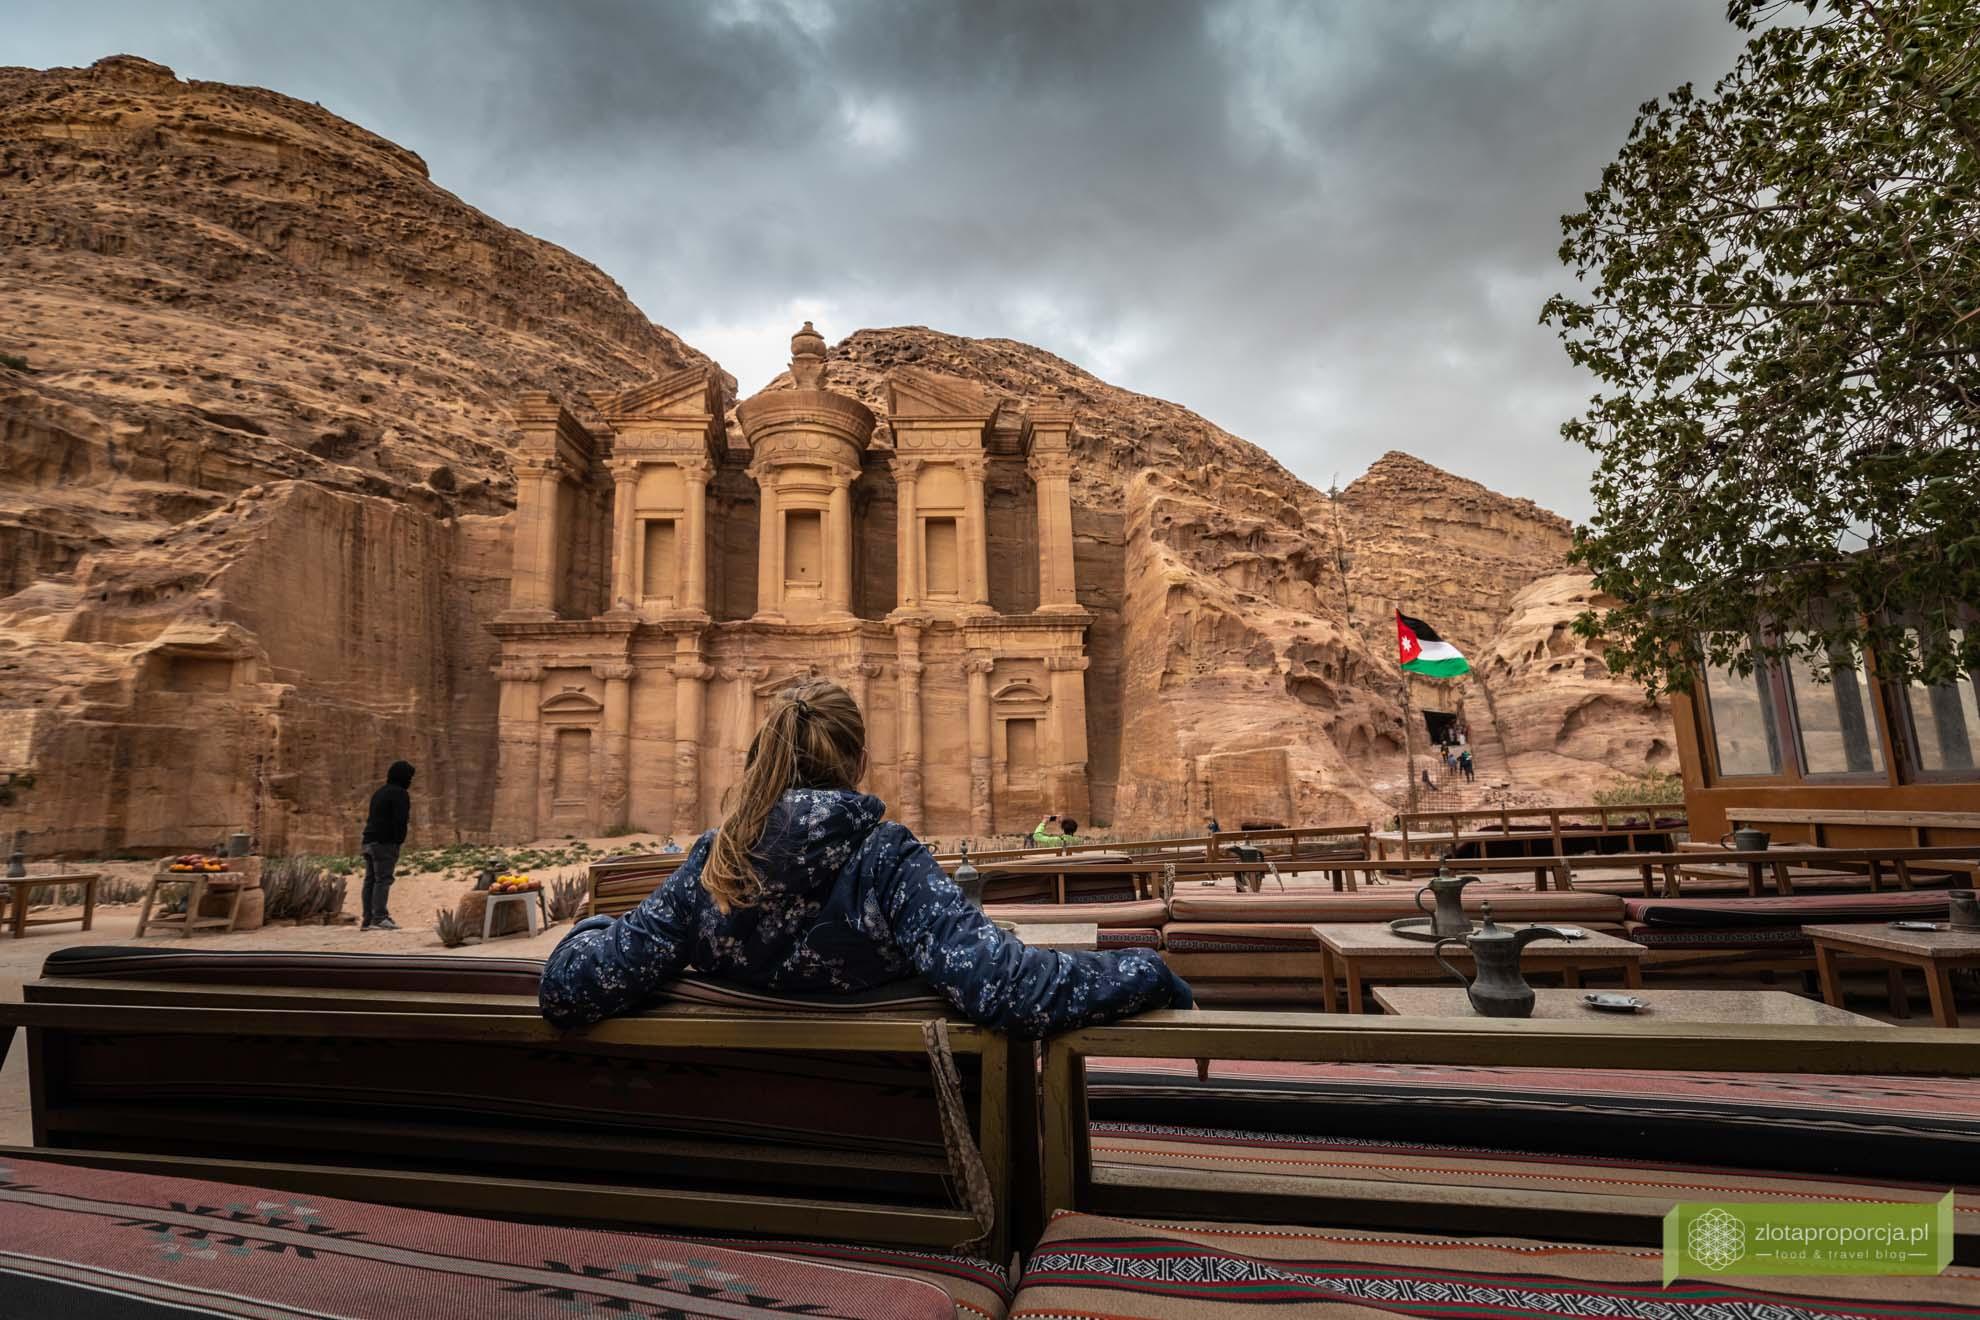 Petra; Jordania; atrakcje Petry; miasto wykute w skale; Petra Jordania; Petra cud świata; miasto Nabatejczyków; Klasztor Petra; Ad Dajr;